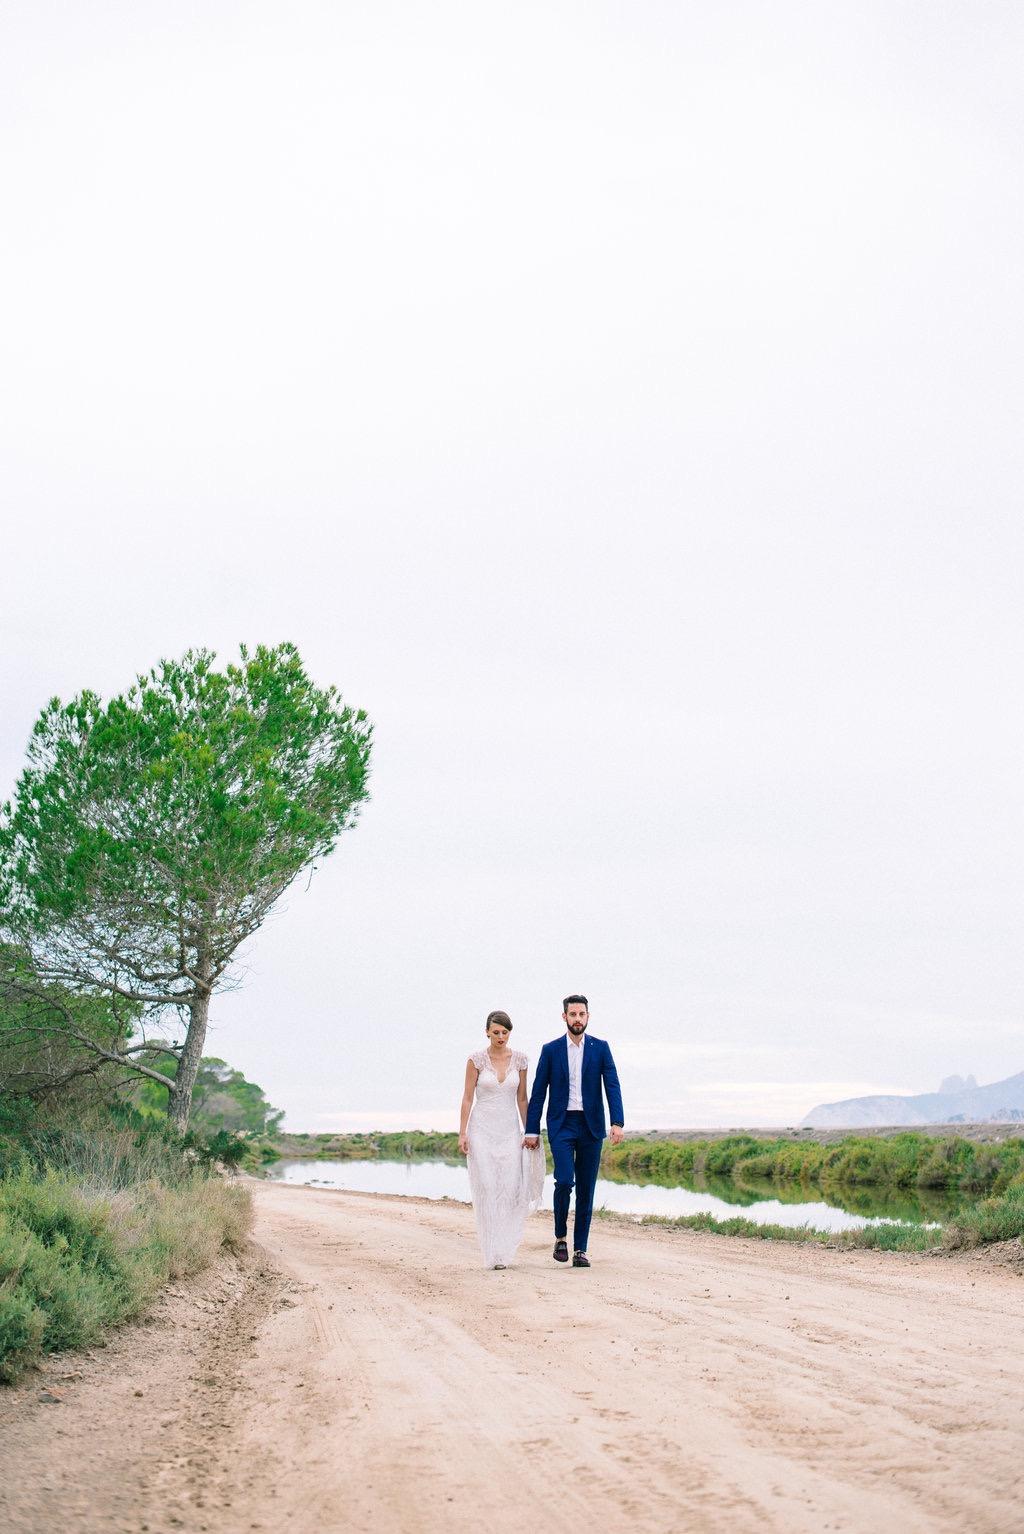 Leo and Paulina - Experimental beach